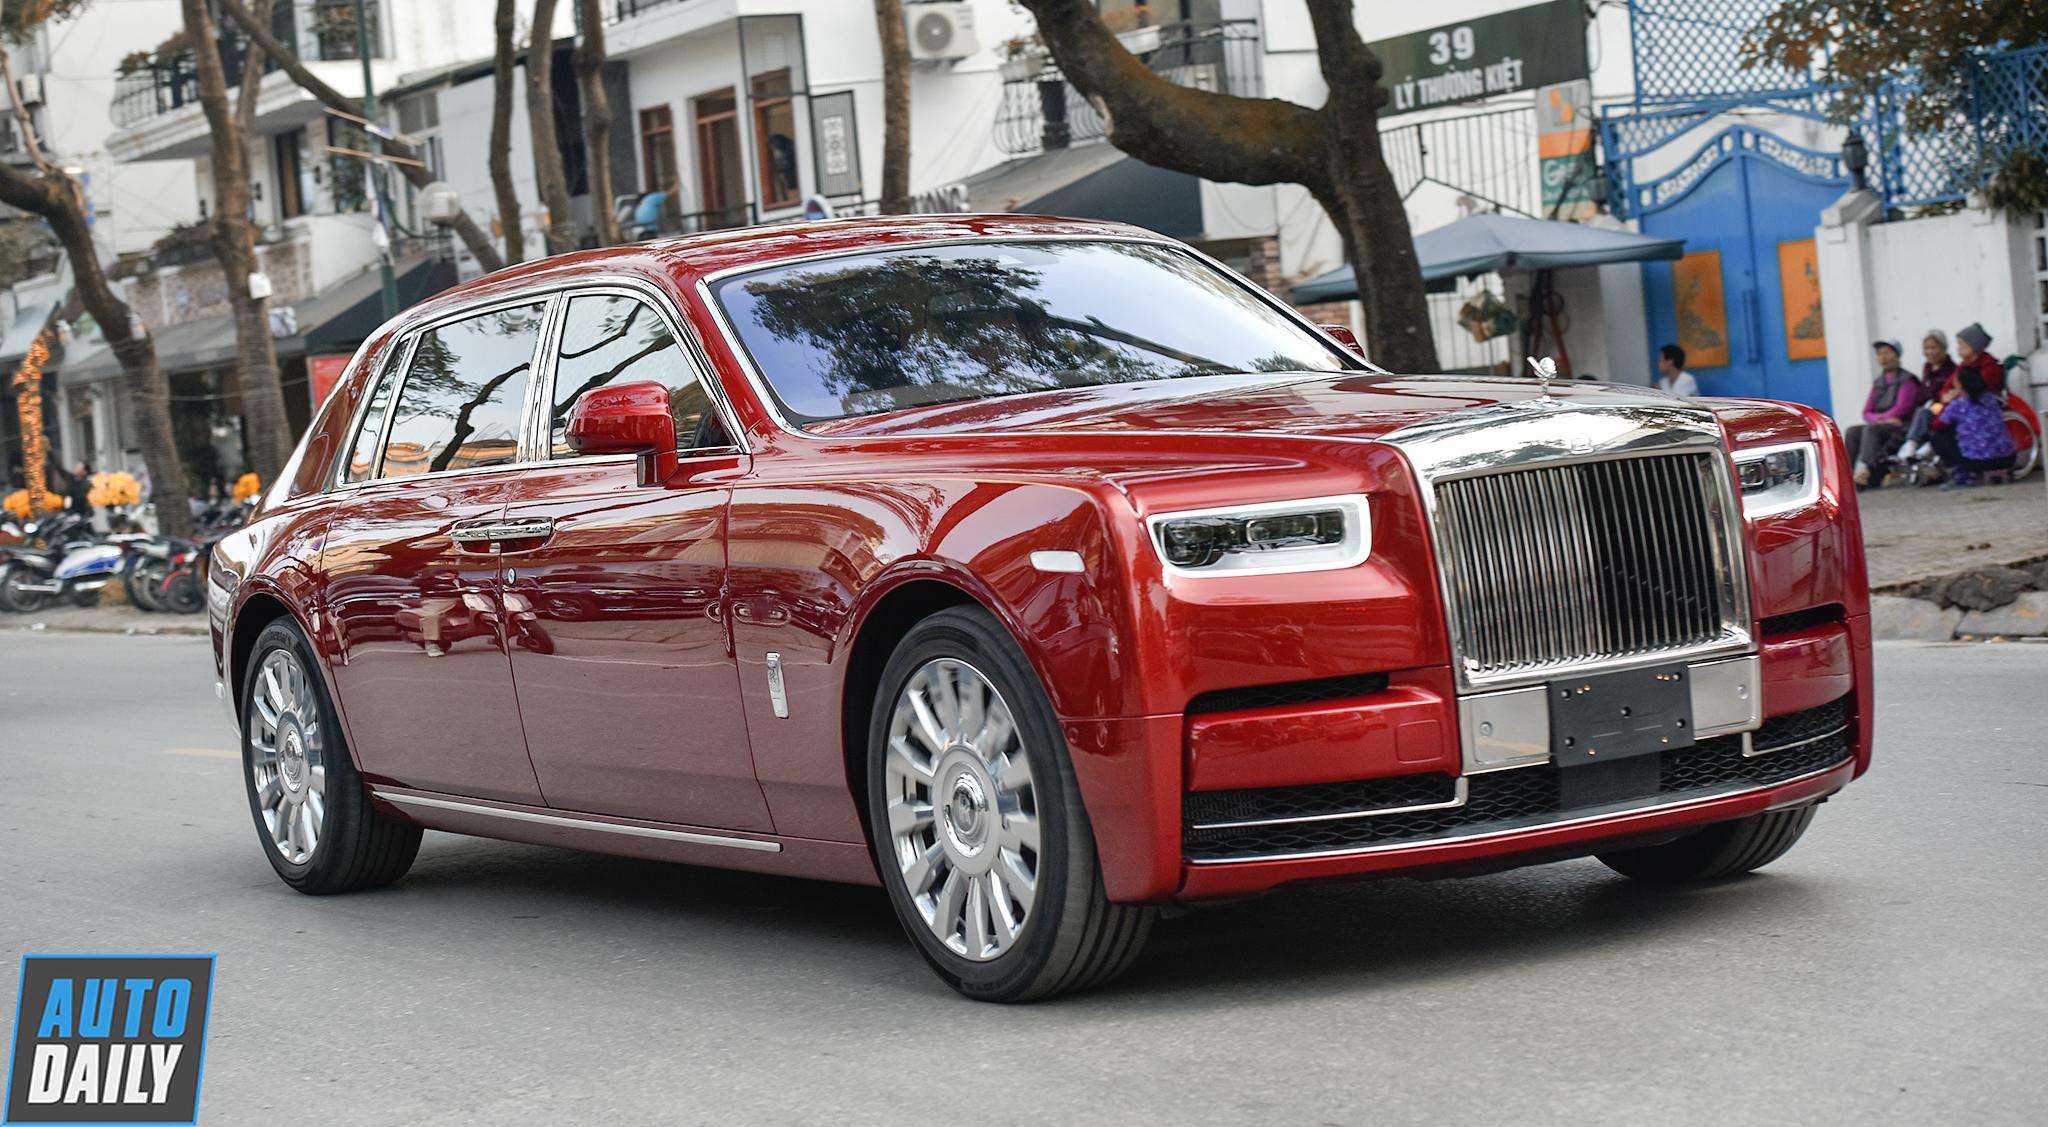 rolls-royce-phantom-2018-autodaily-22.jpg